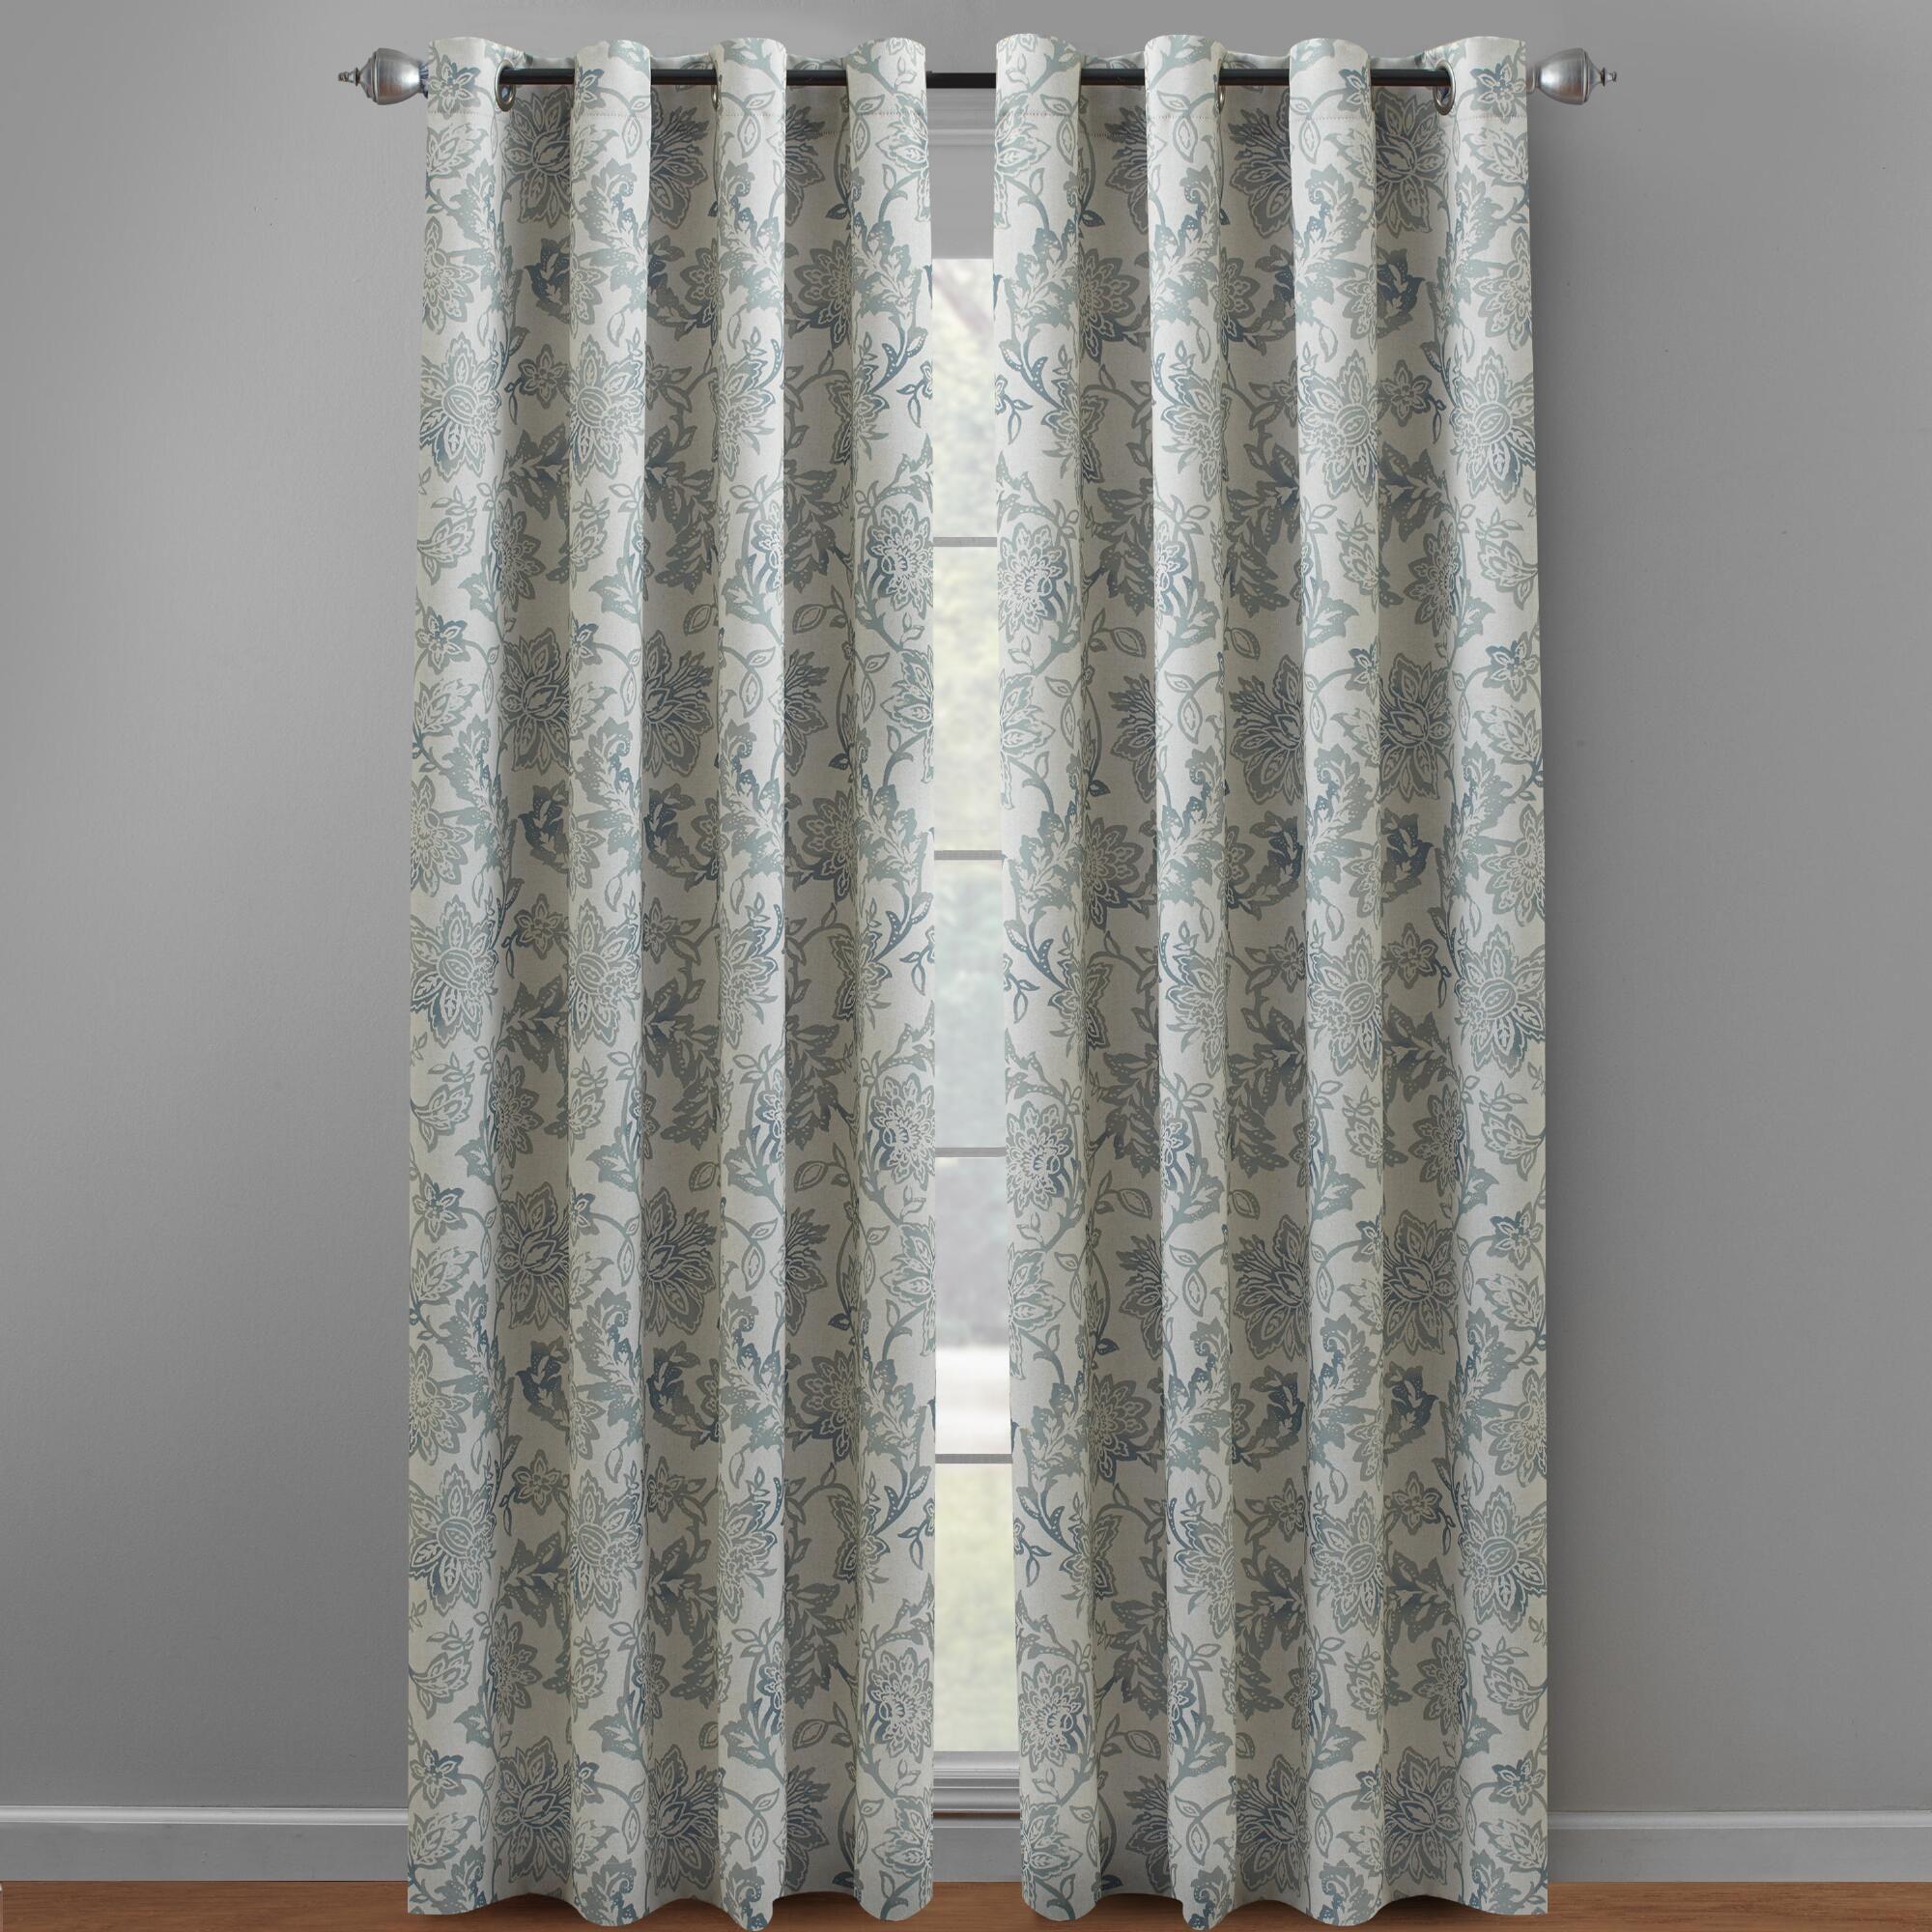 Ivy Eclipse Sundown Grommet Window Panels Set Of 2 Window Panels Furniture Gifts Energy Saving Curtains